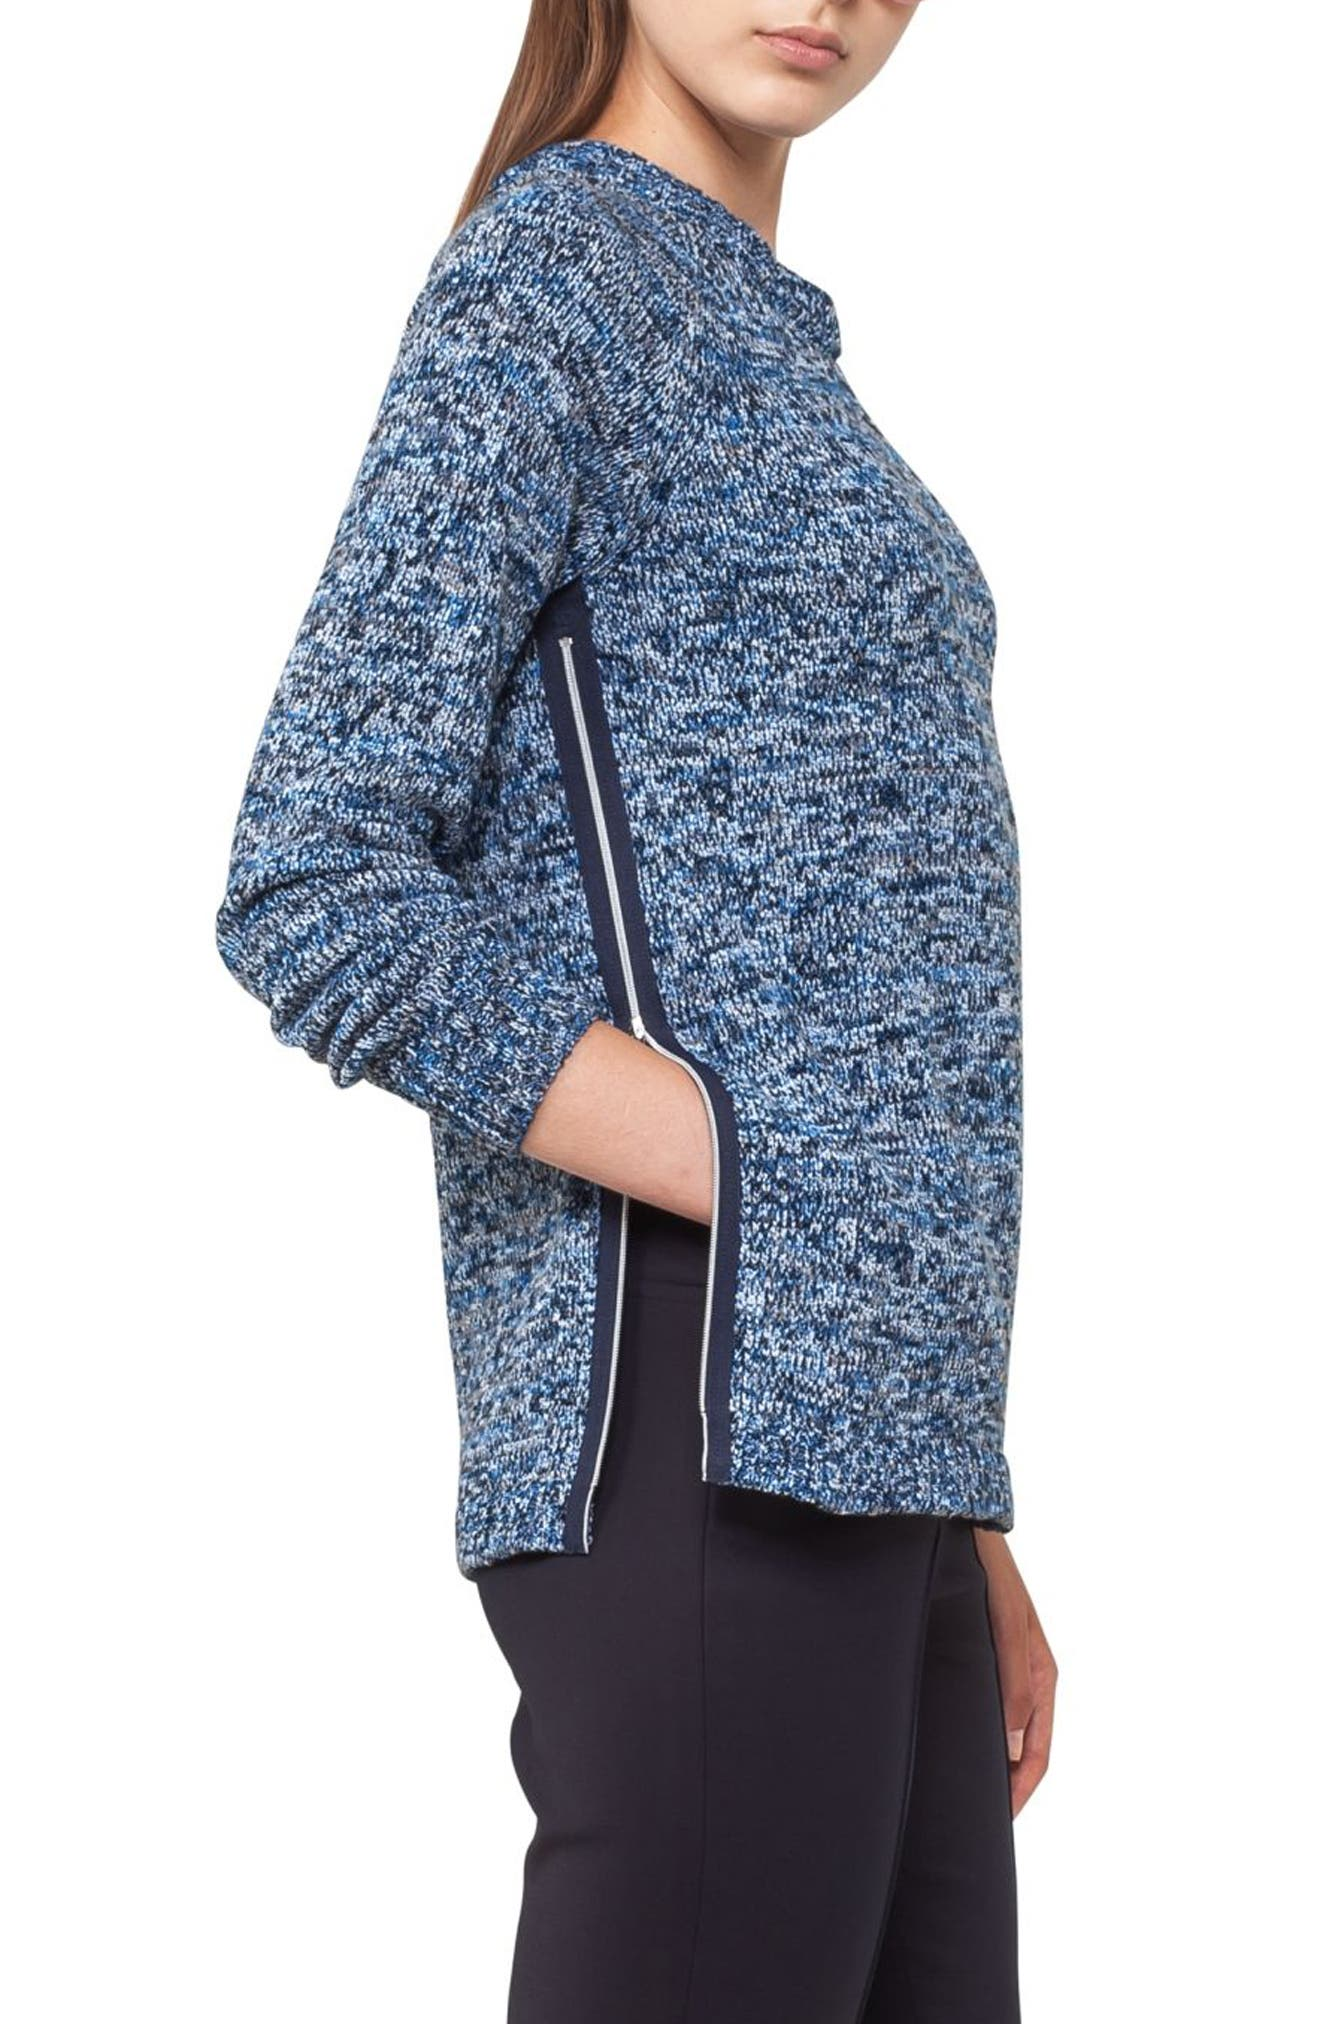 Cotton Blend Knit Pullover,                             Alternate thumbnail 3, color,                             Indigo-Cream